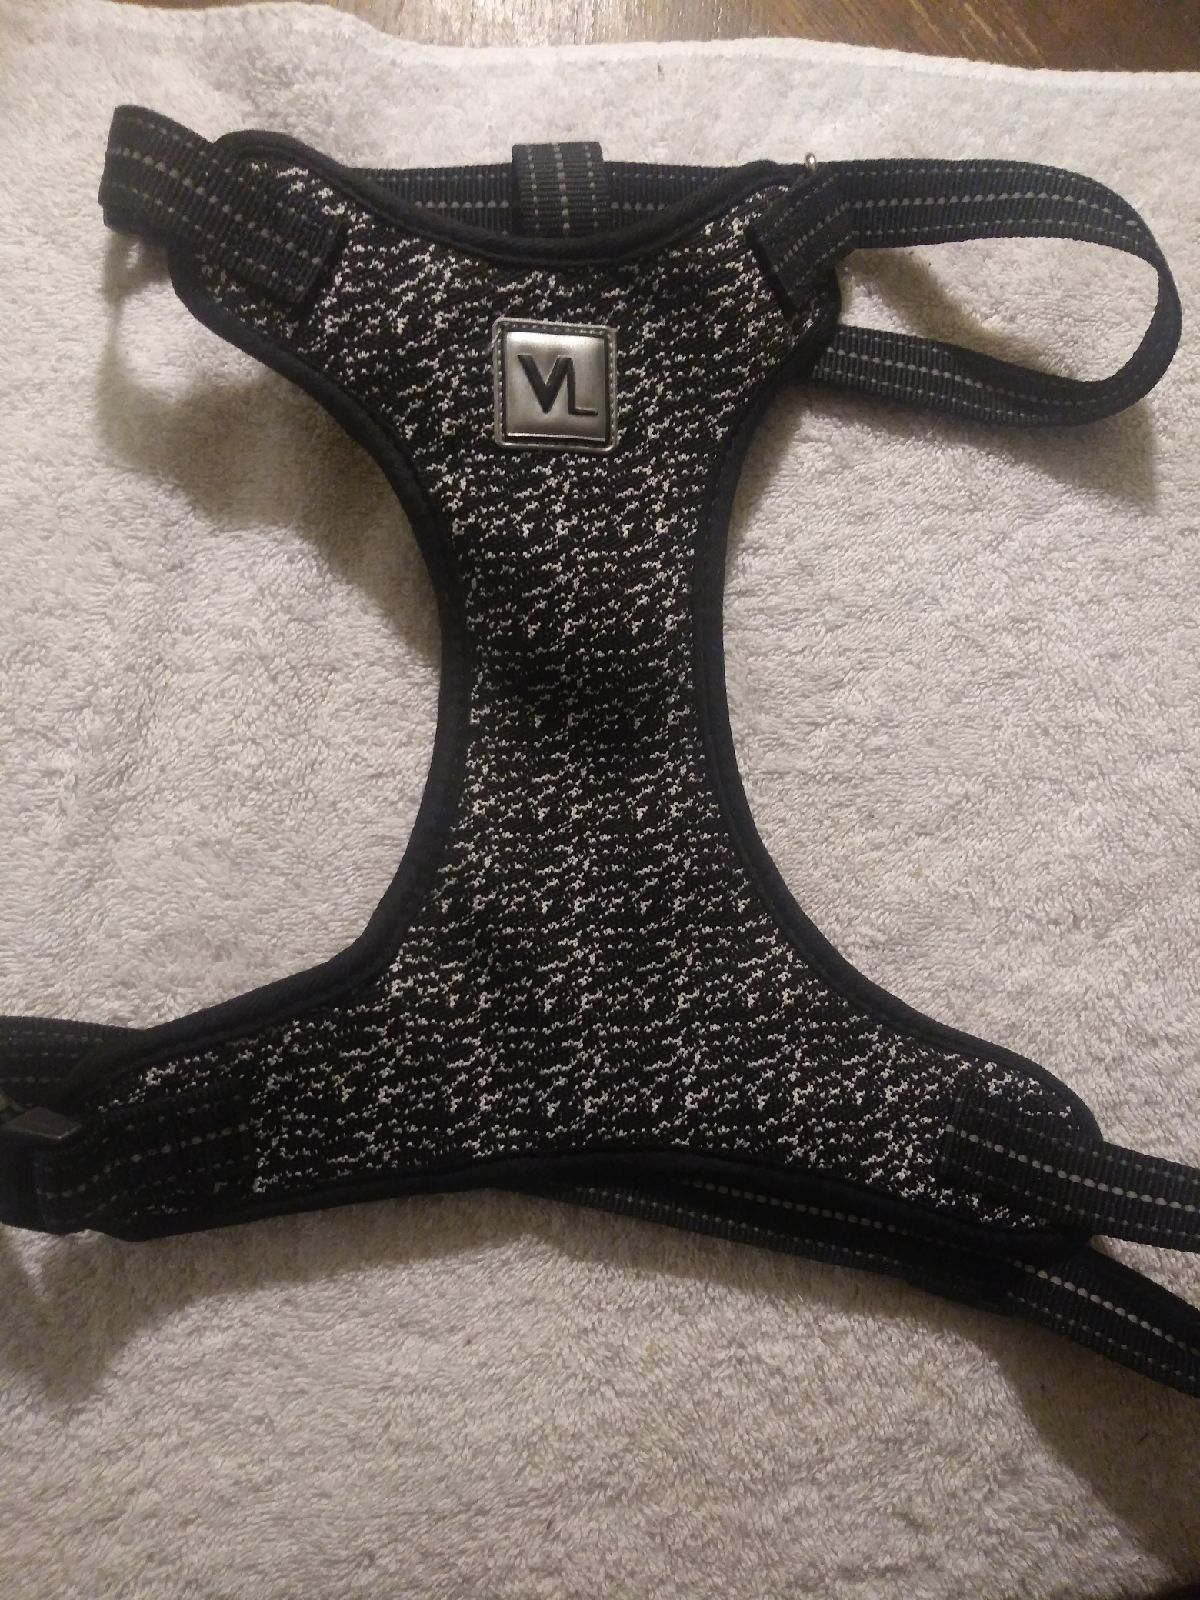 New vibrantlife pet harness size xs